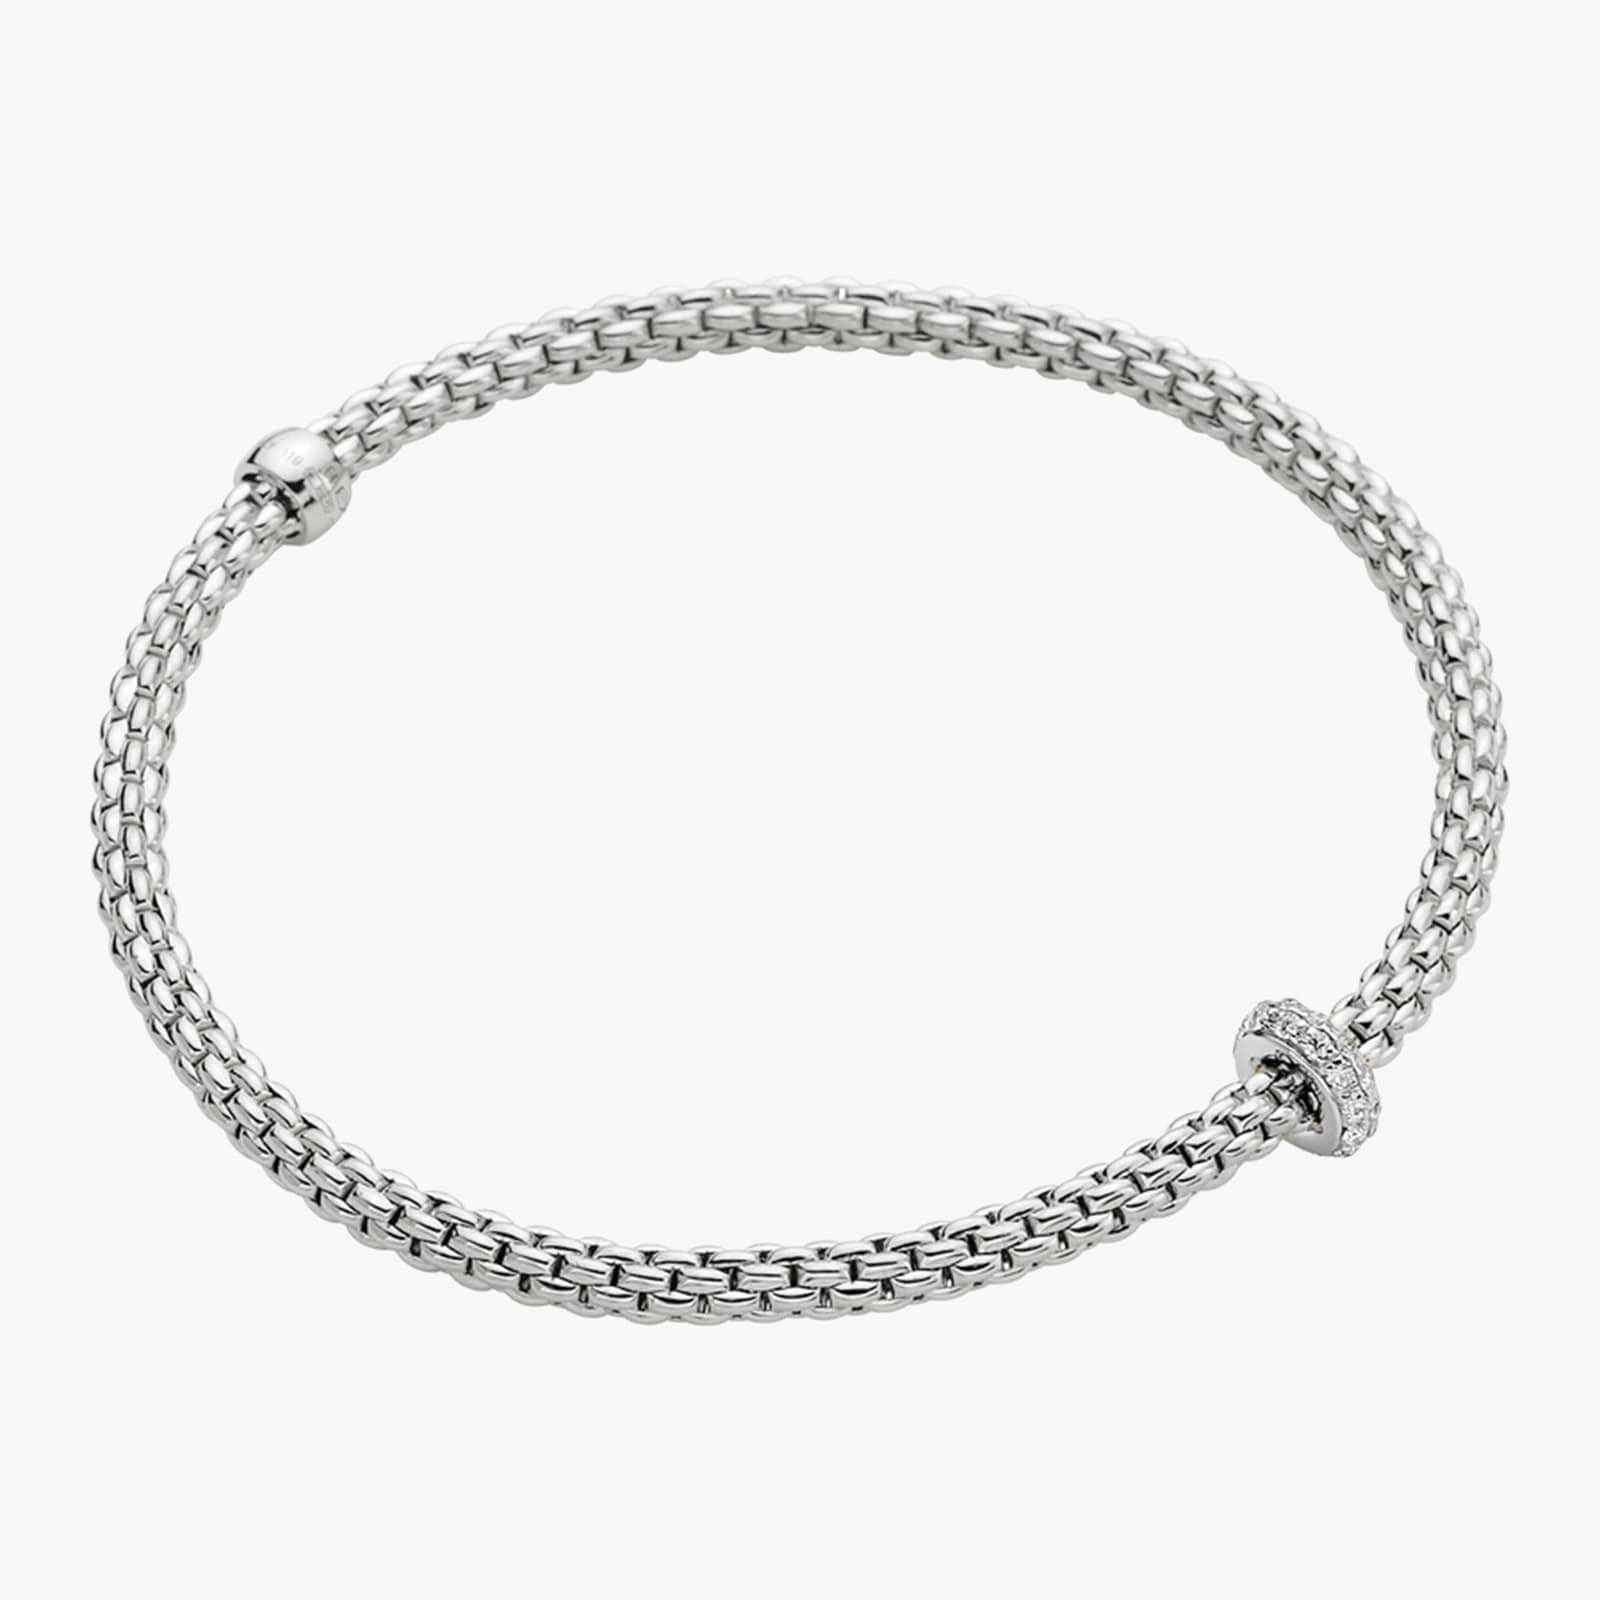 18k White Gold 0.18cttw Diamond Prima Bracelet